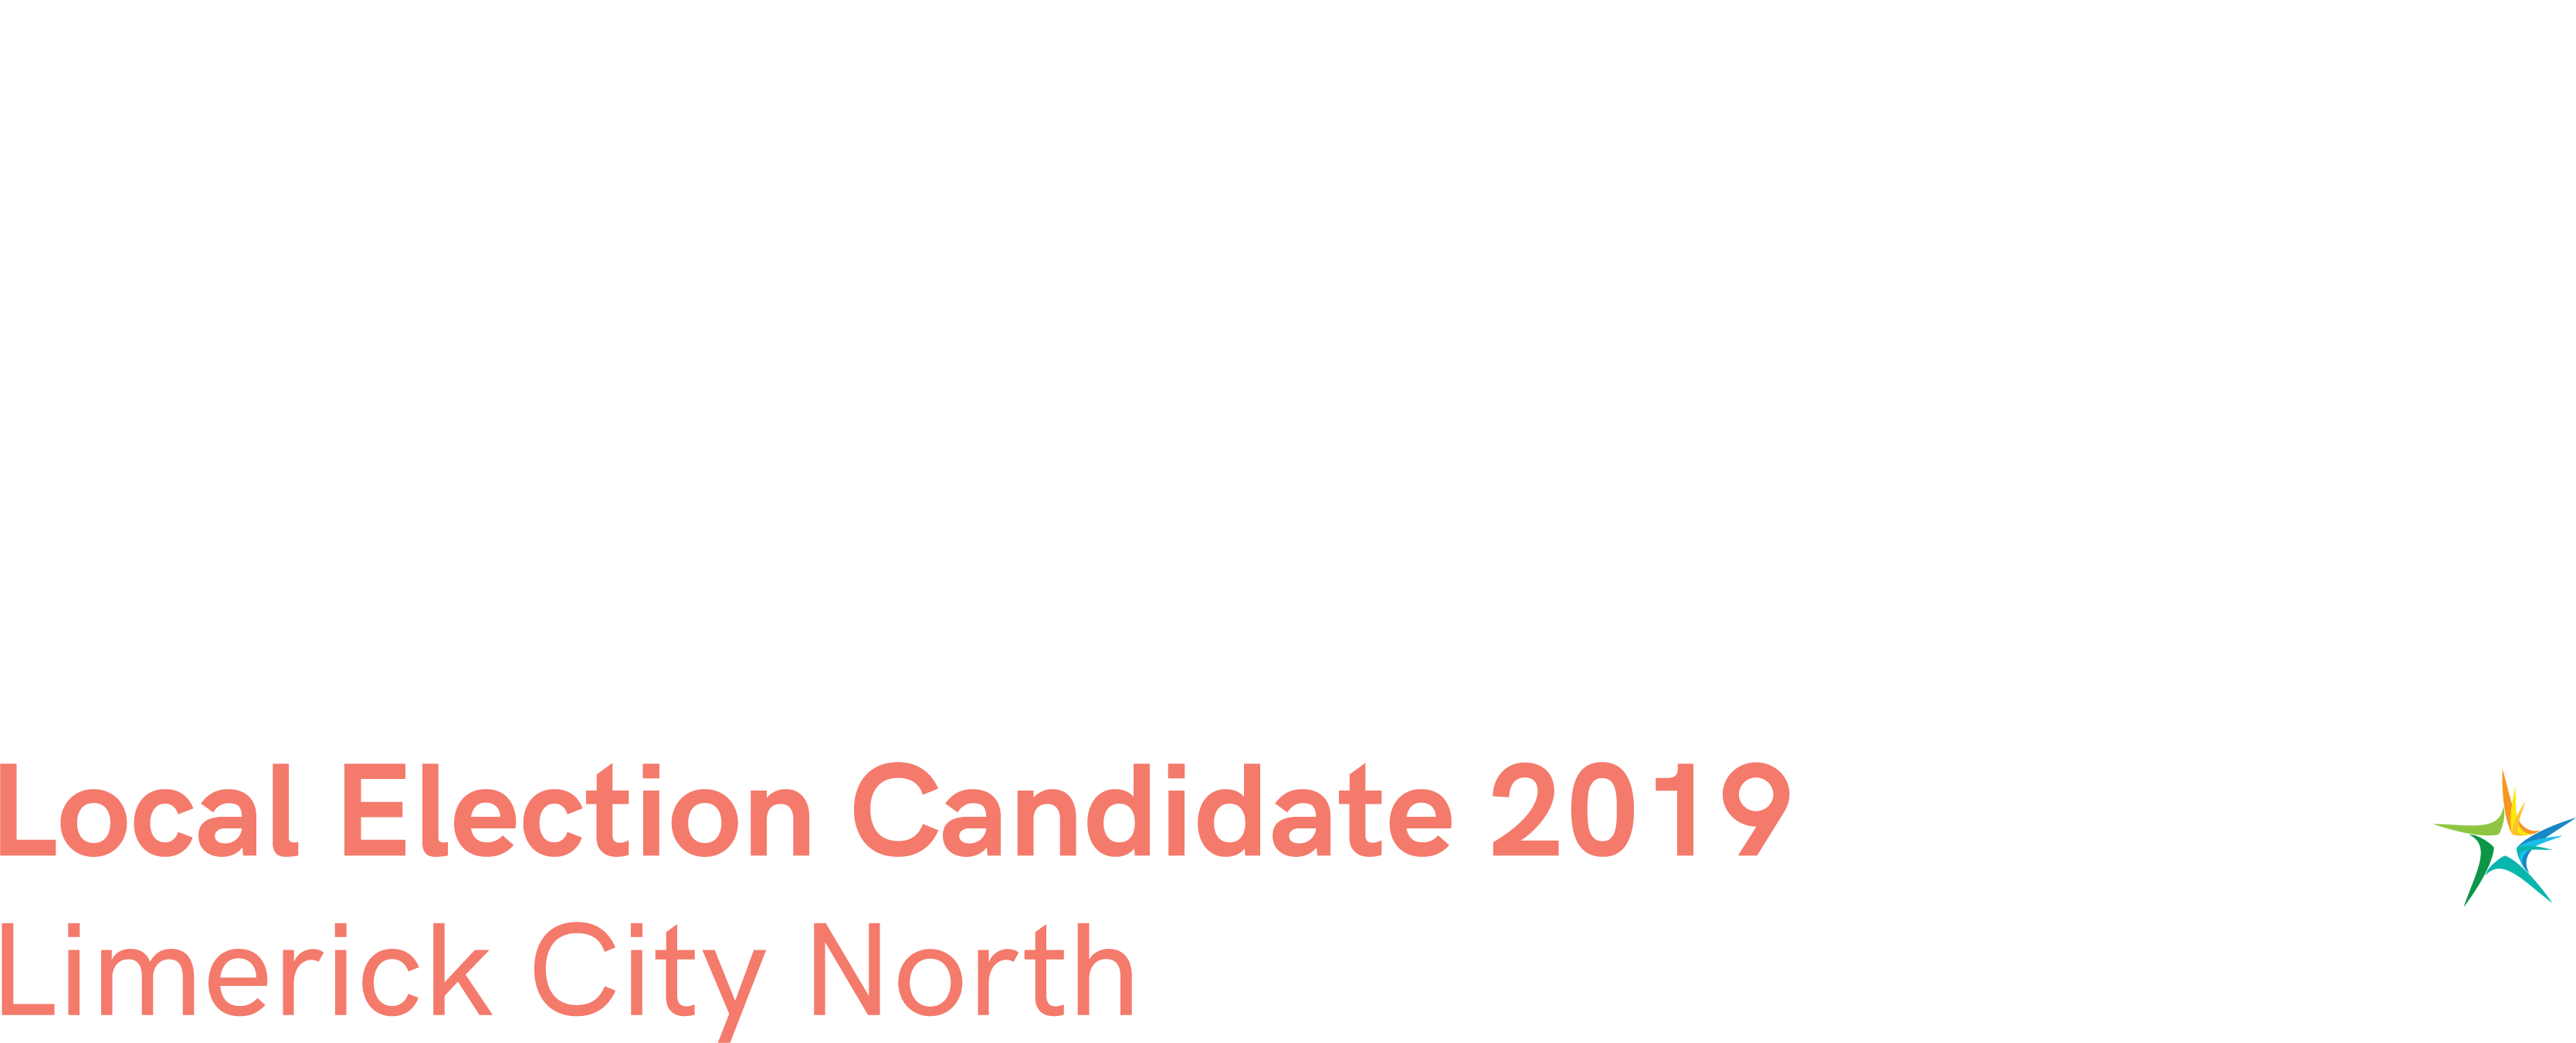 Olivia O'Sullivan | Limerick City | Ireland